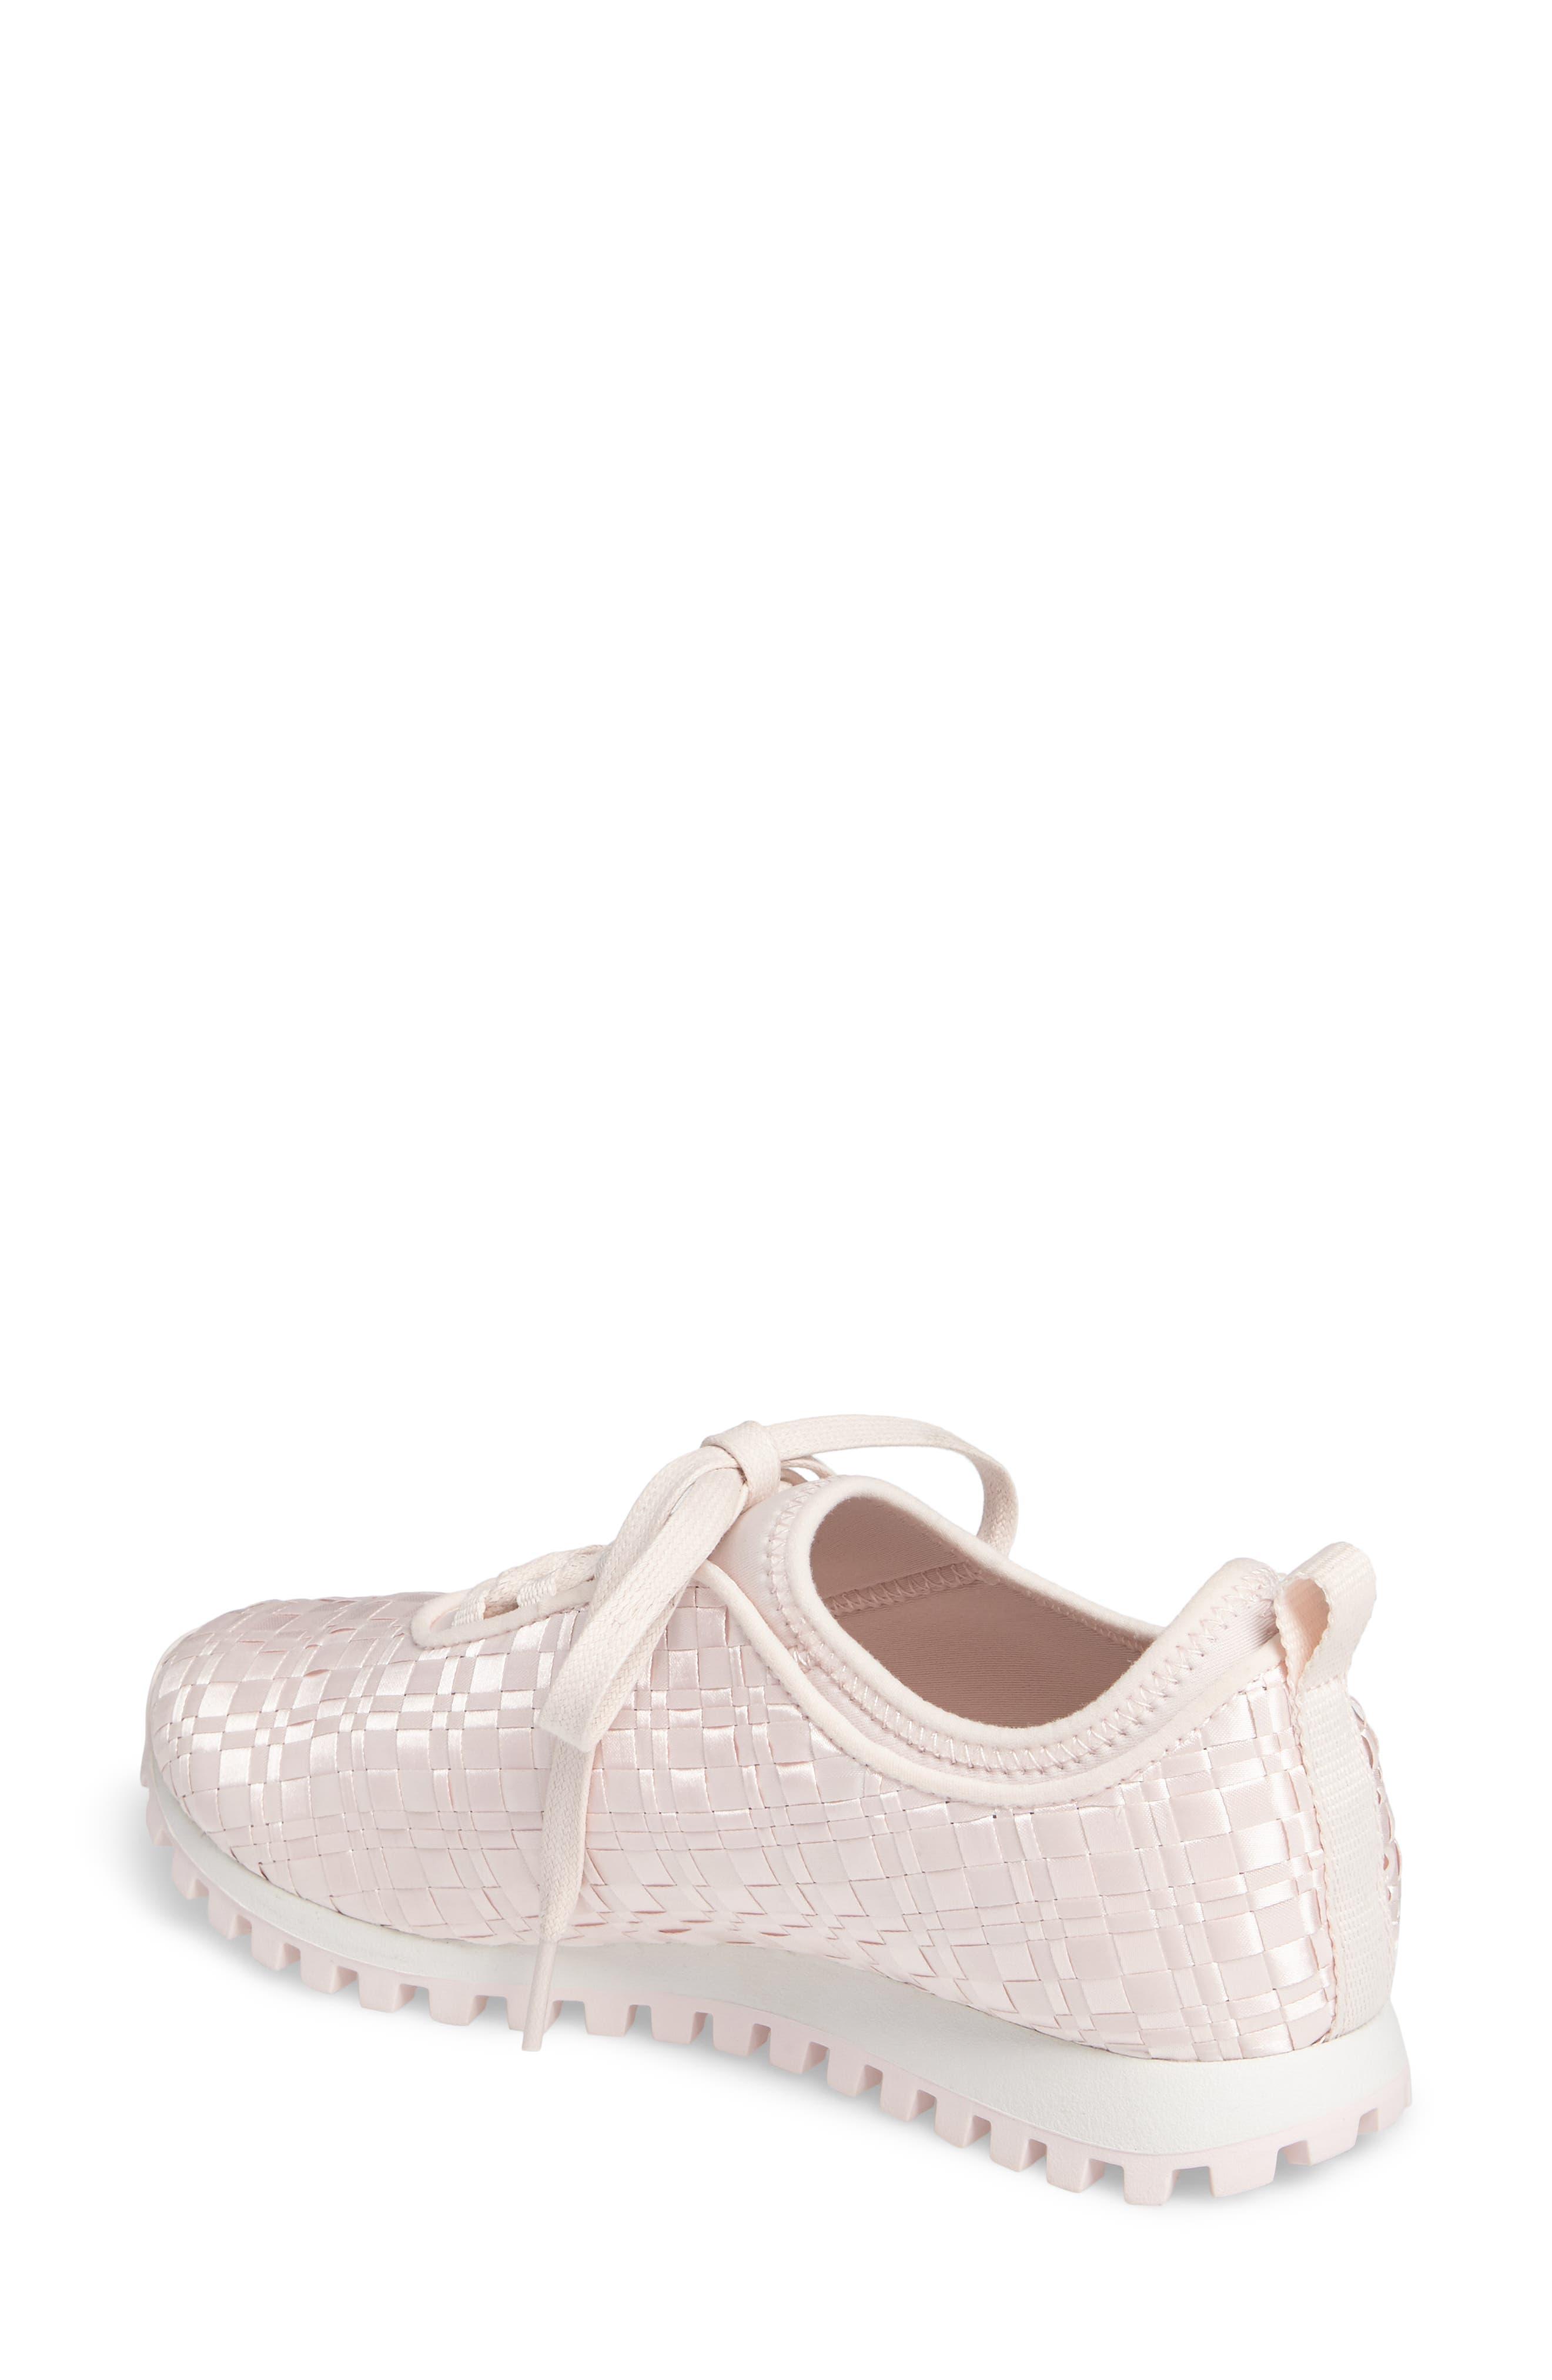 Lynn Sock Fit Woven Sneaker,                             Alternate thumbnail 2, color,                             Dusty Rose